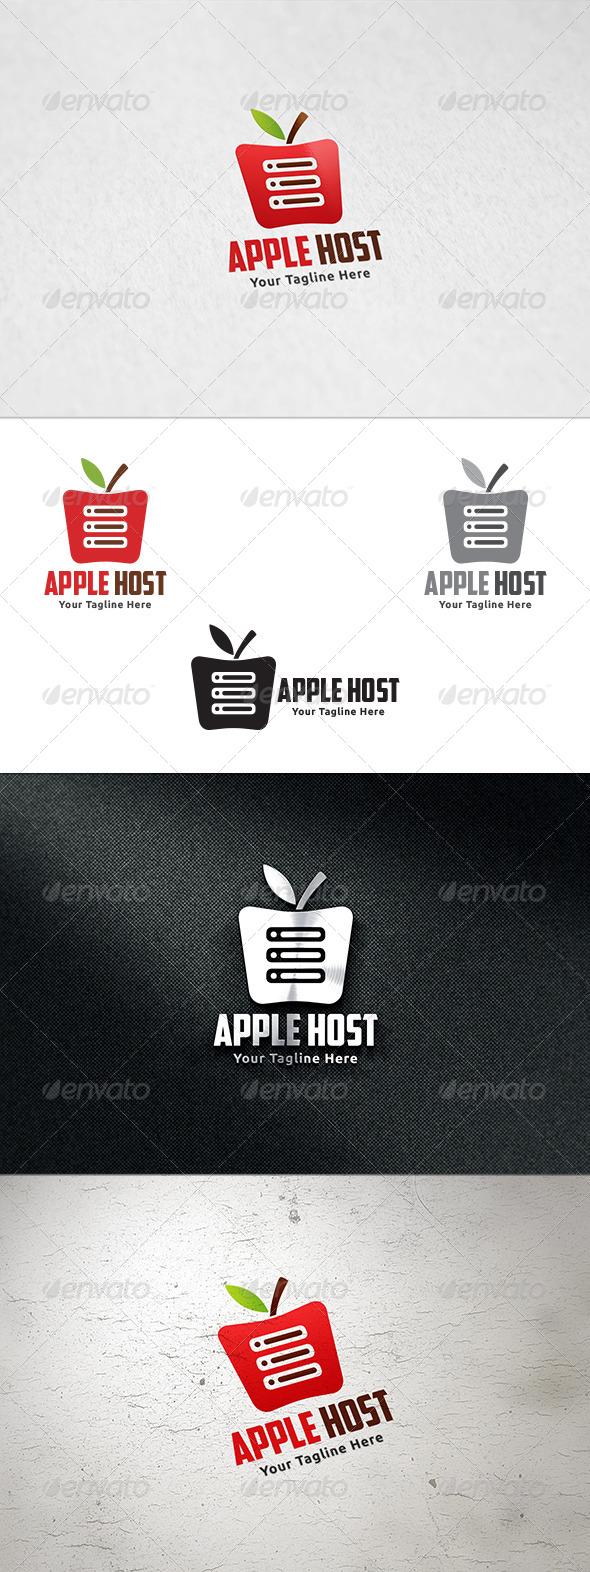 GraphicRiver Apple Host Logo Template 8664697